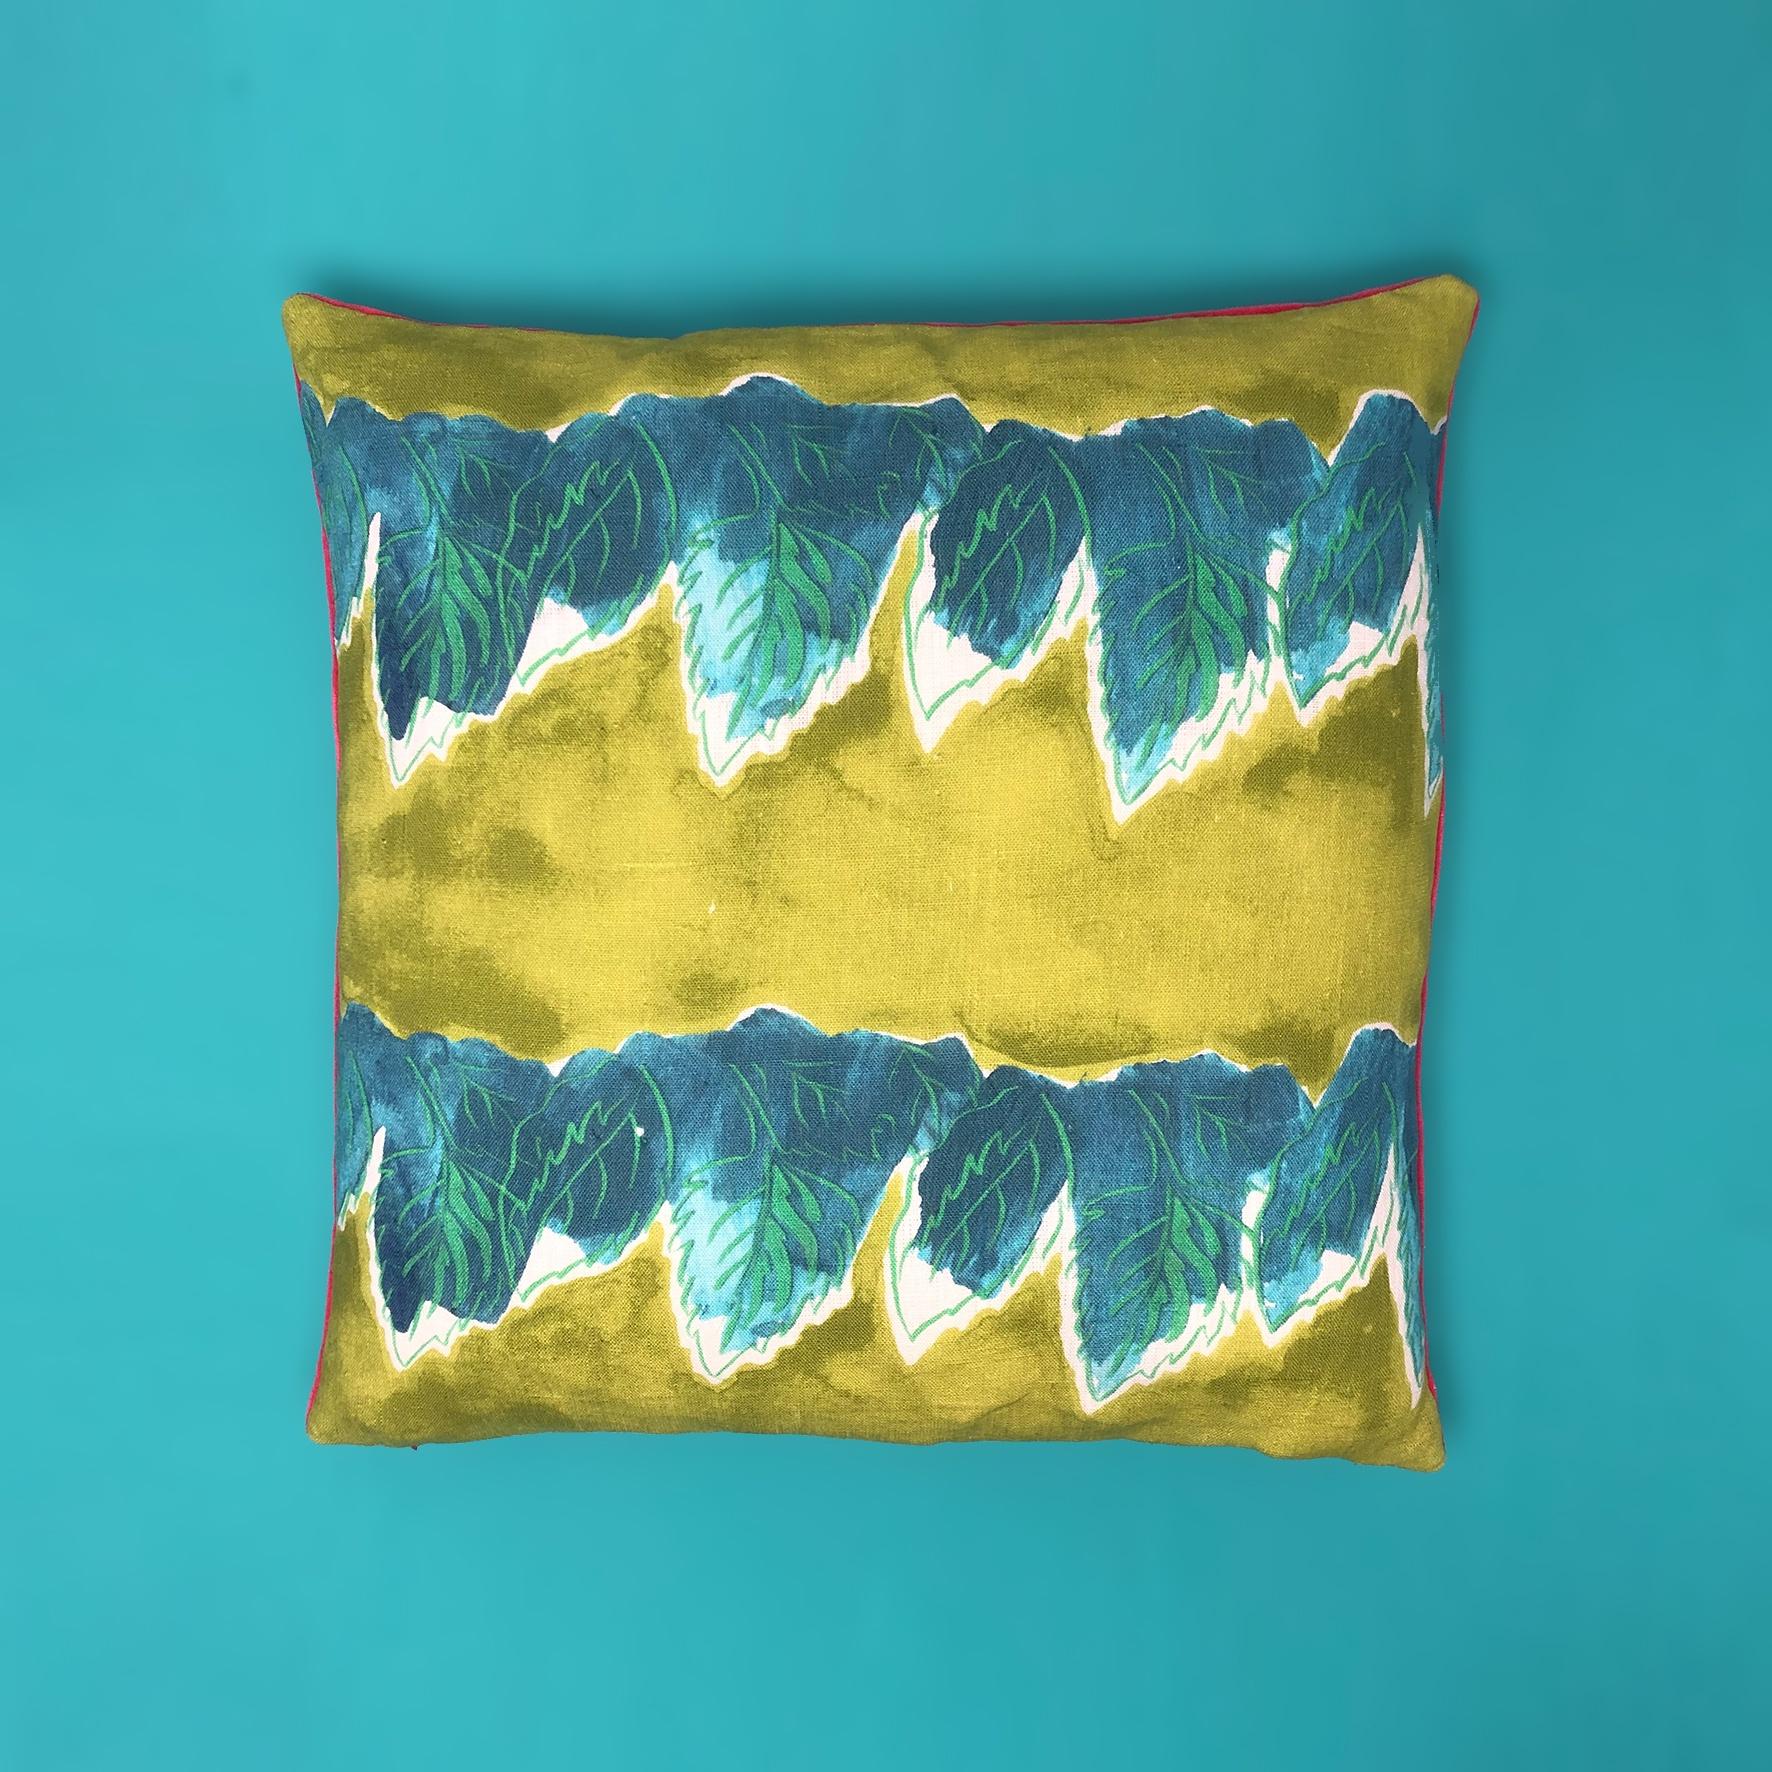 Sap Cushion